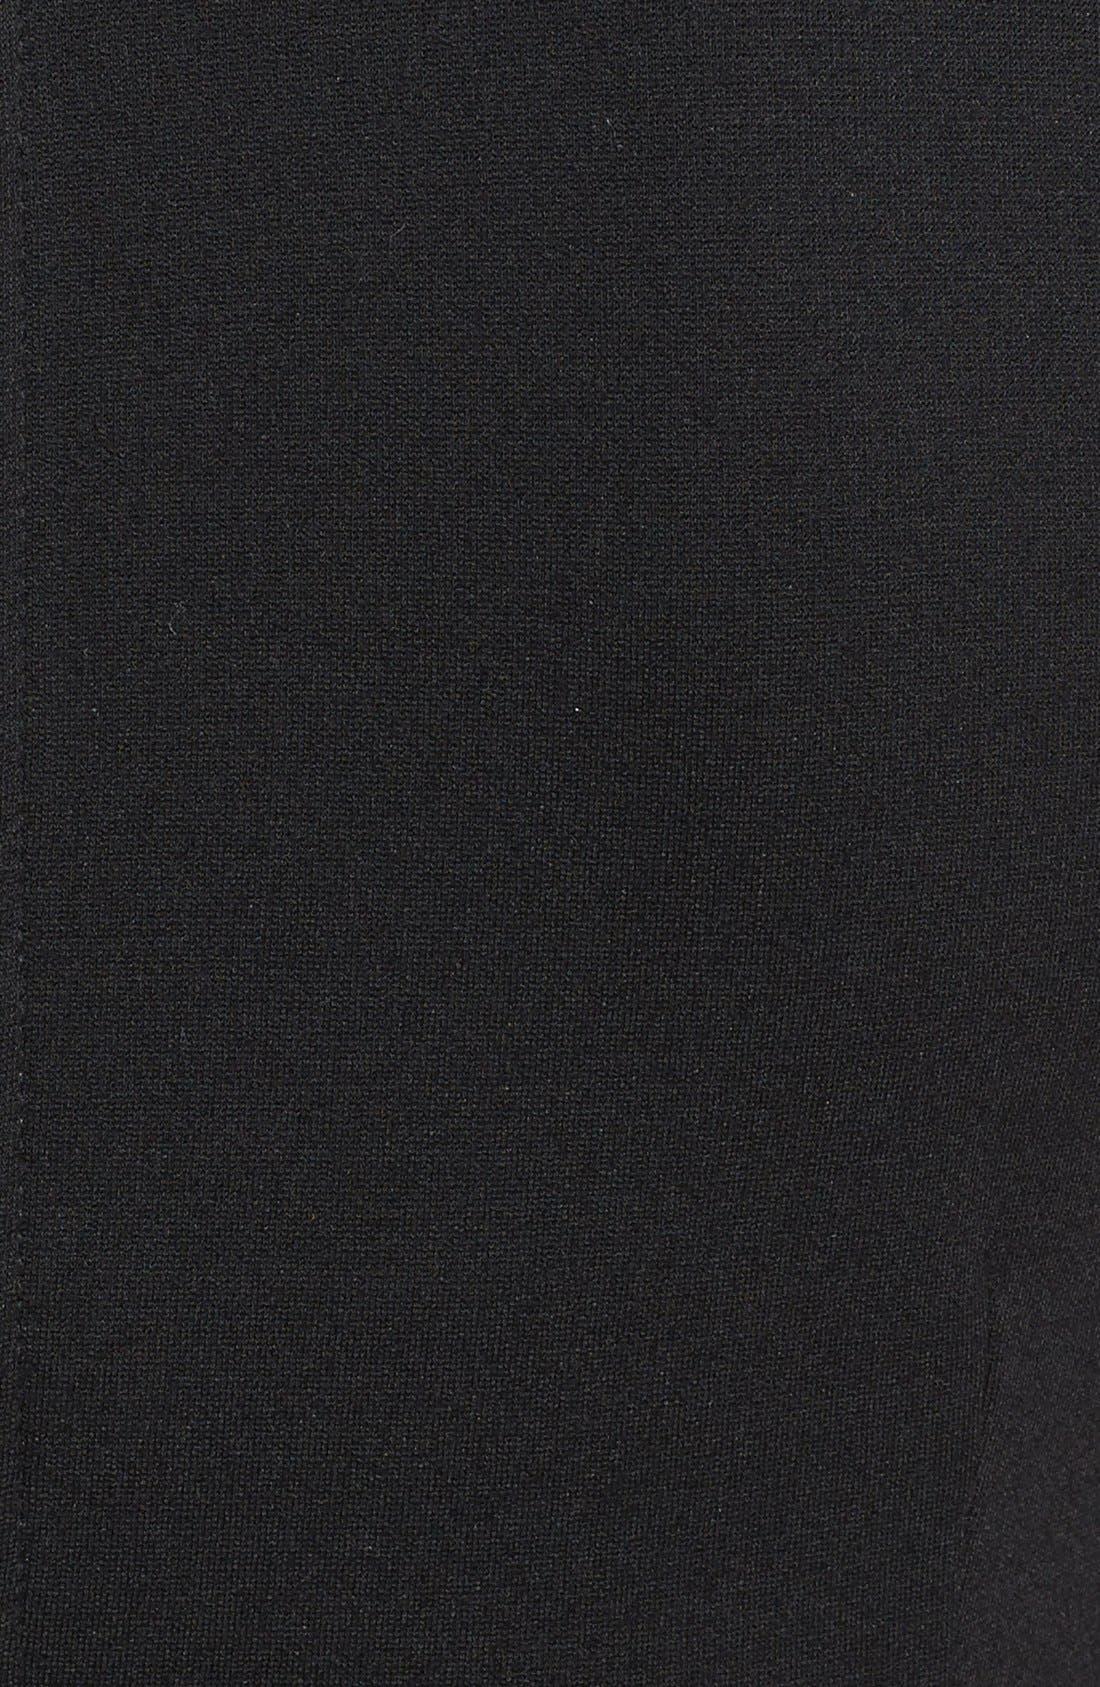 Alternate Image 3  - Kenneth Cole New York 'Samantha' Dress